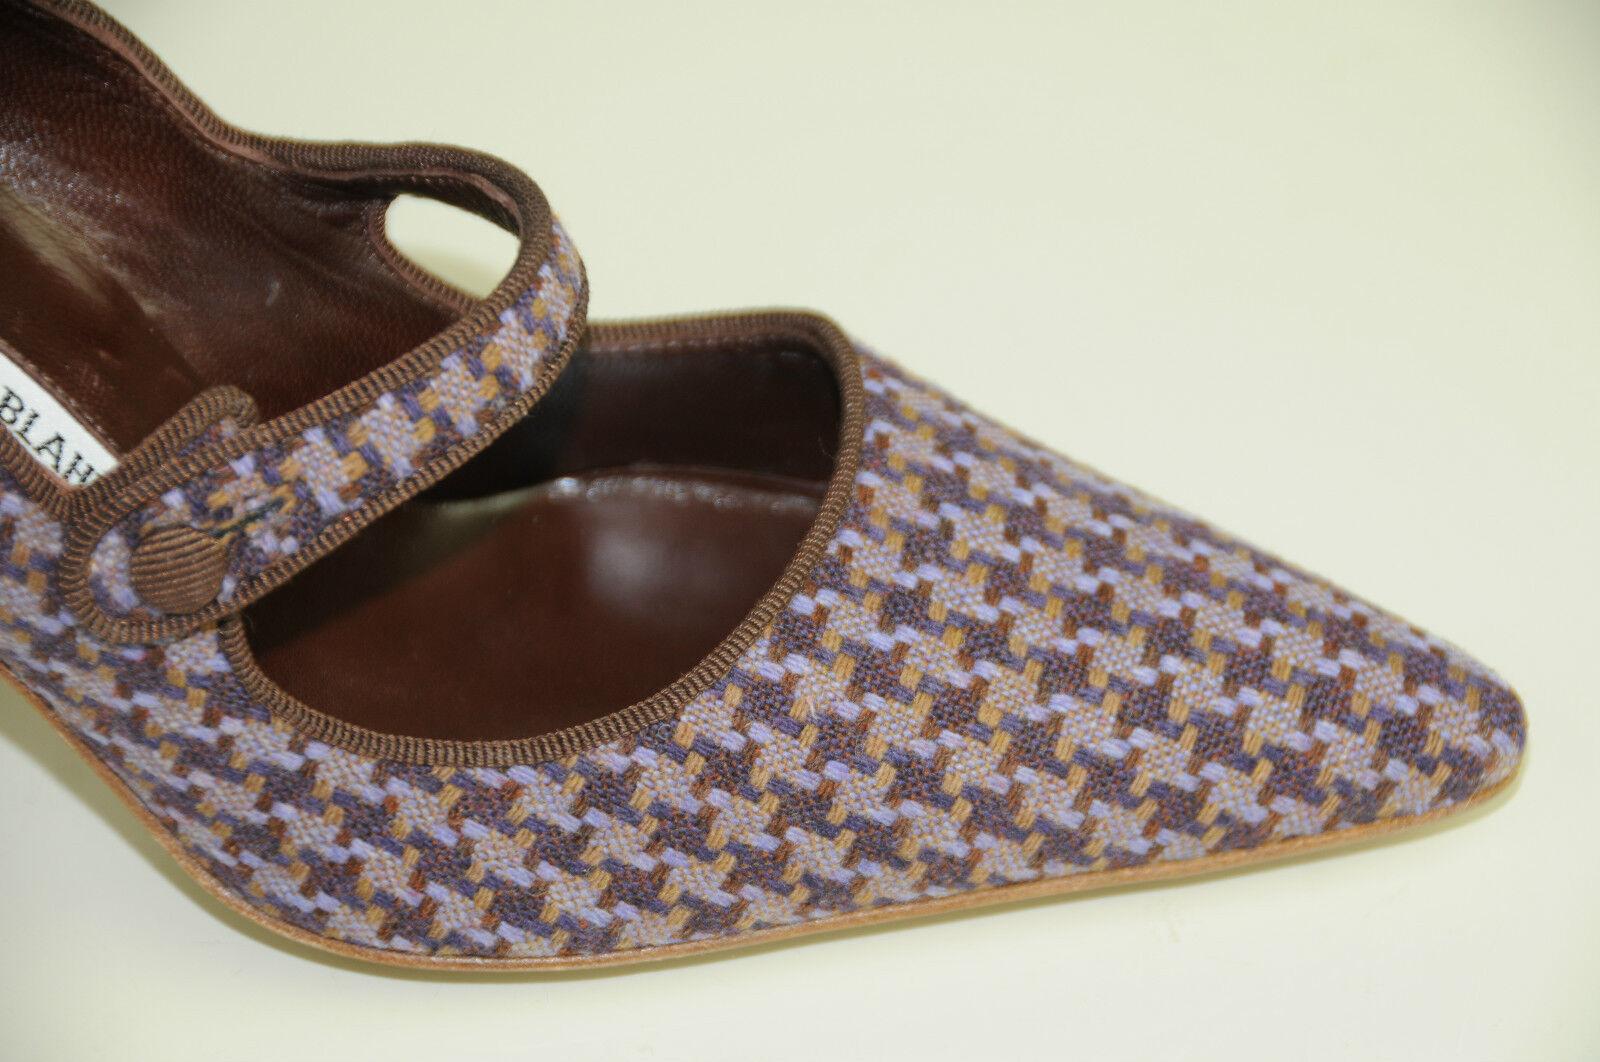 685 NEW NEW NEW MANOLO BLAHNIK Campari Mary Jane Purple Brown TWEED SHOES 36 36.5 6ae9de